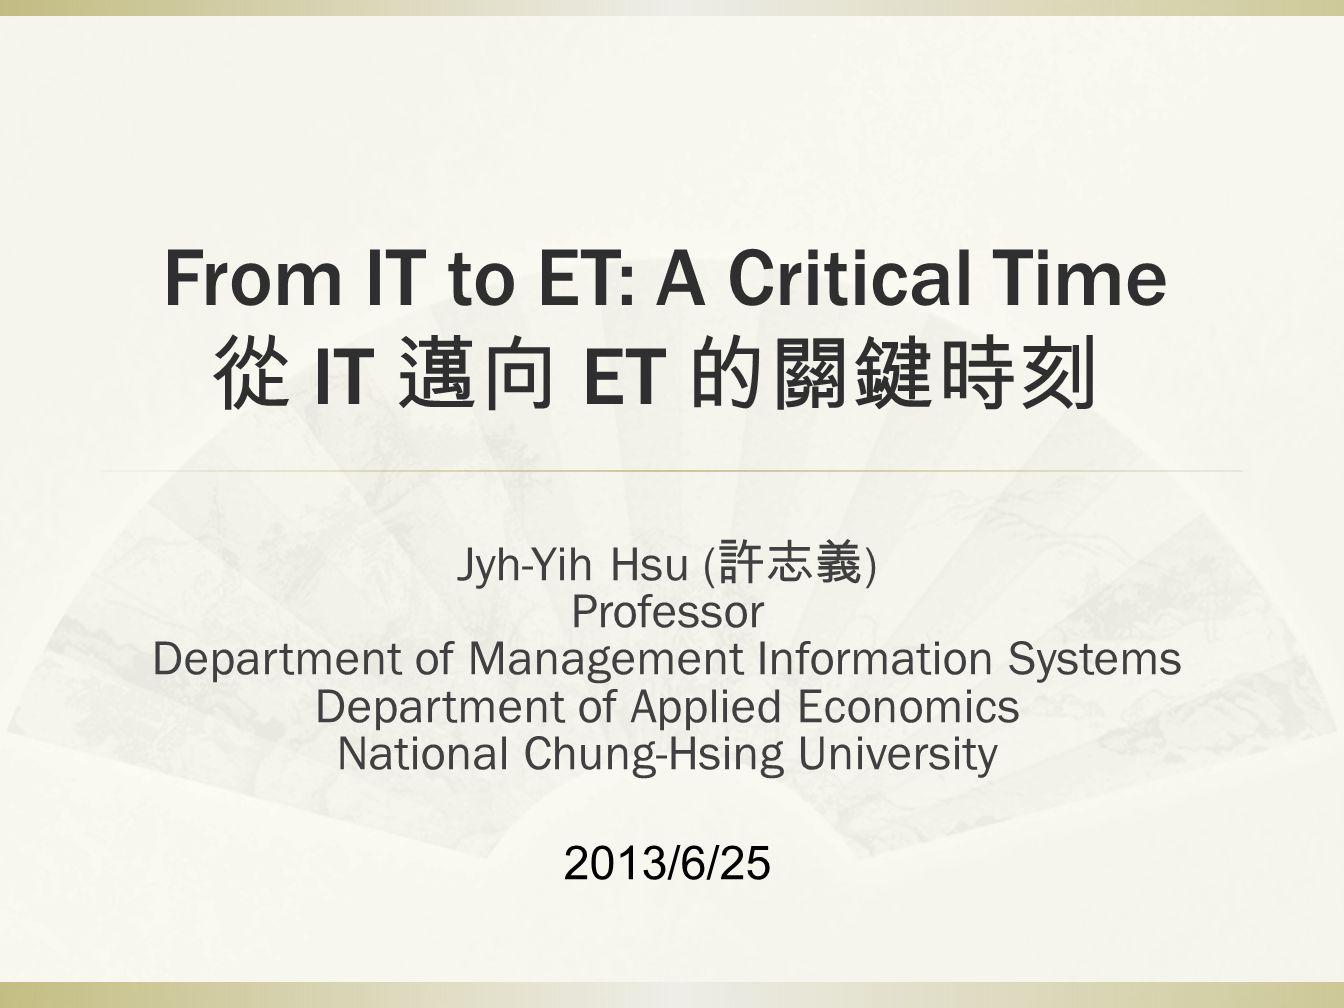 From IT to ET: A Critical Time 從 IT 邁向 ET 的關鍵時刻 Jyh-Yih Hsu ( 許志義 ) Professor Department of Management Information Systems Department of Applied Economics National Chung-Hsing University 2013/6/25